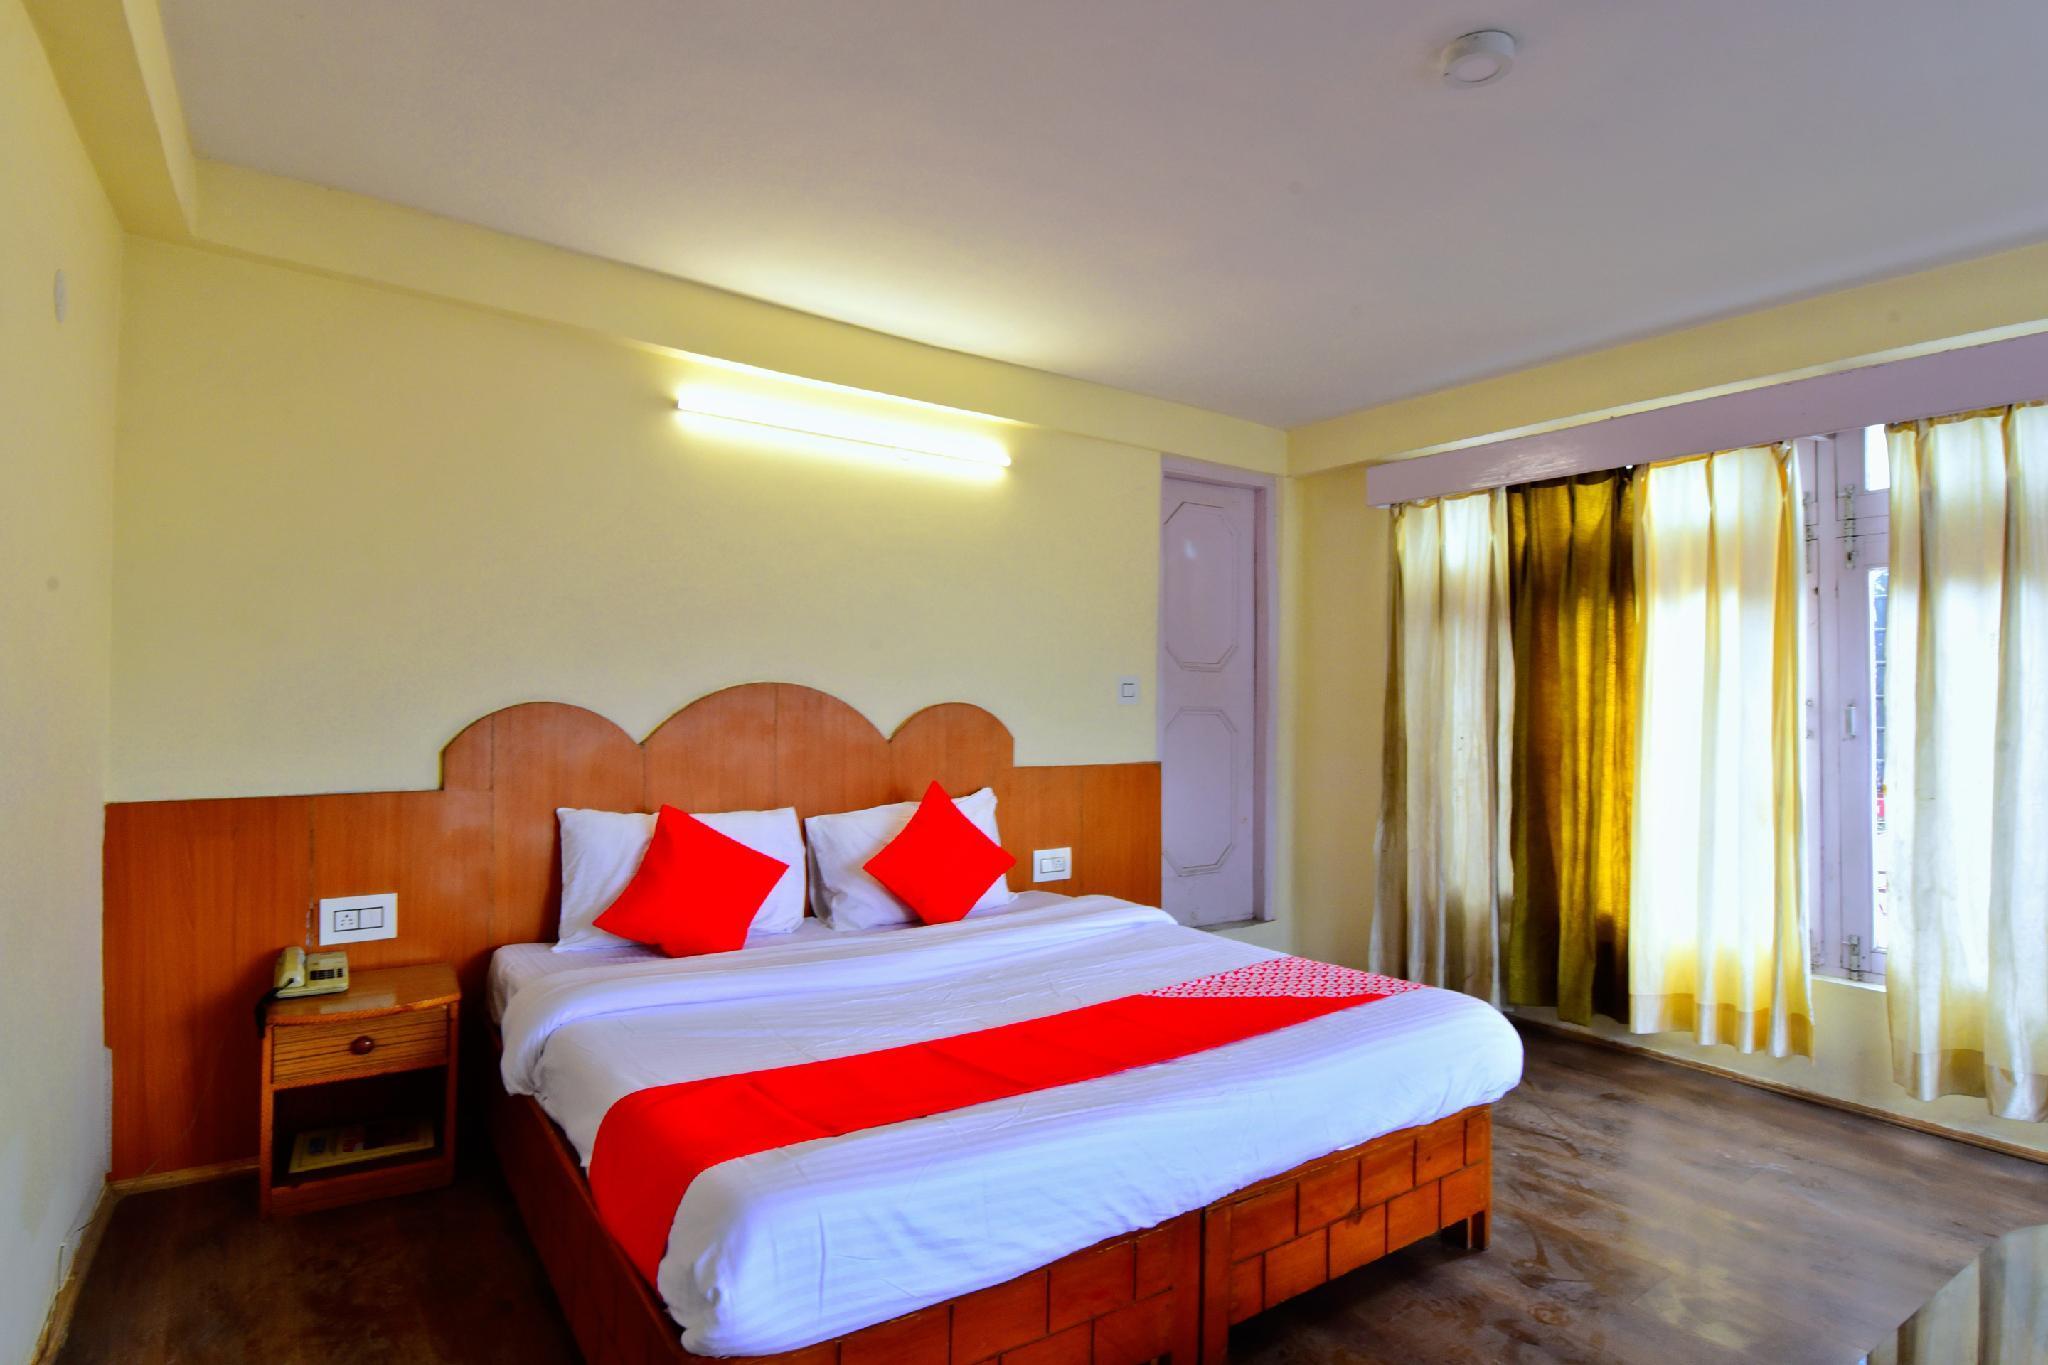 OYO 30387 Pine View Hotel Manali  Manali India